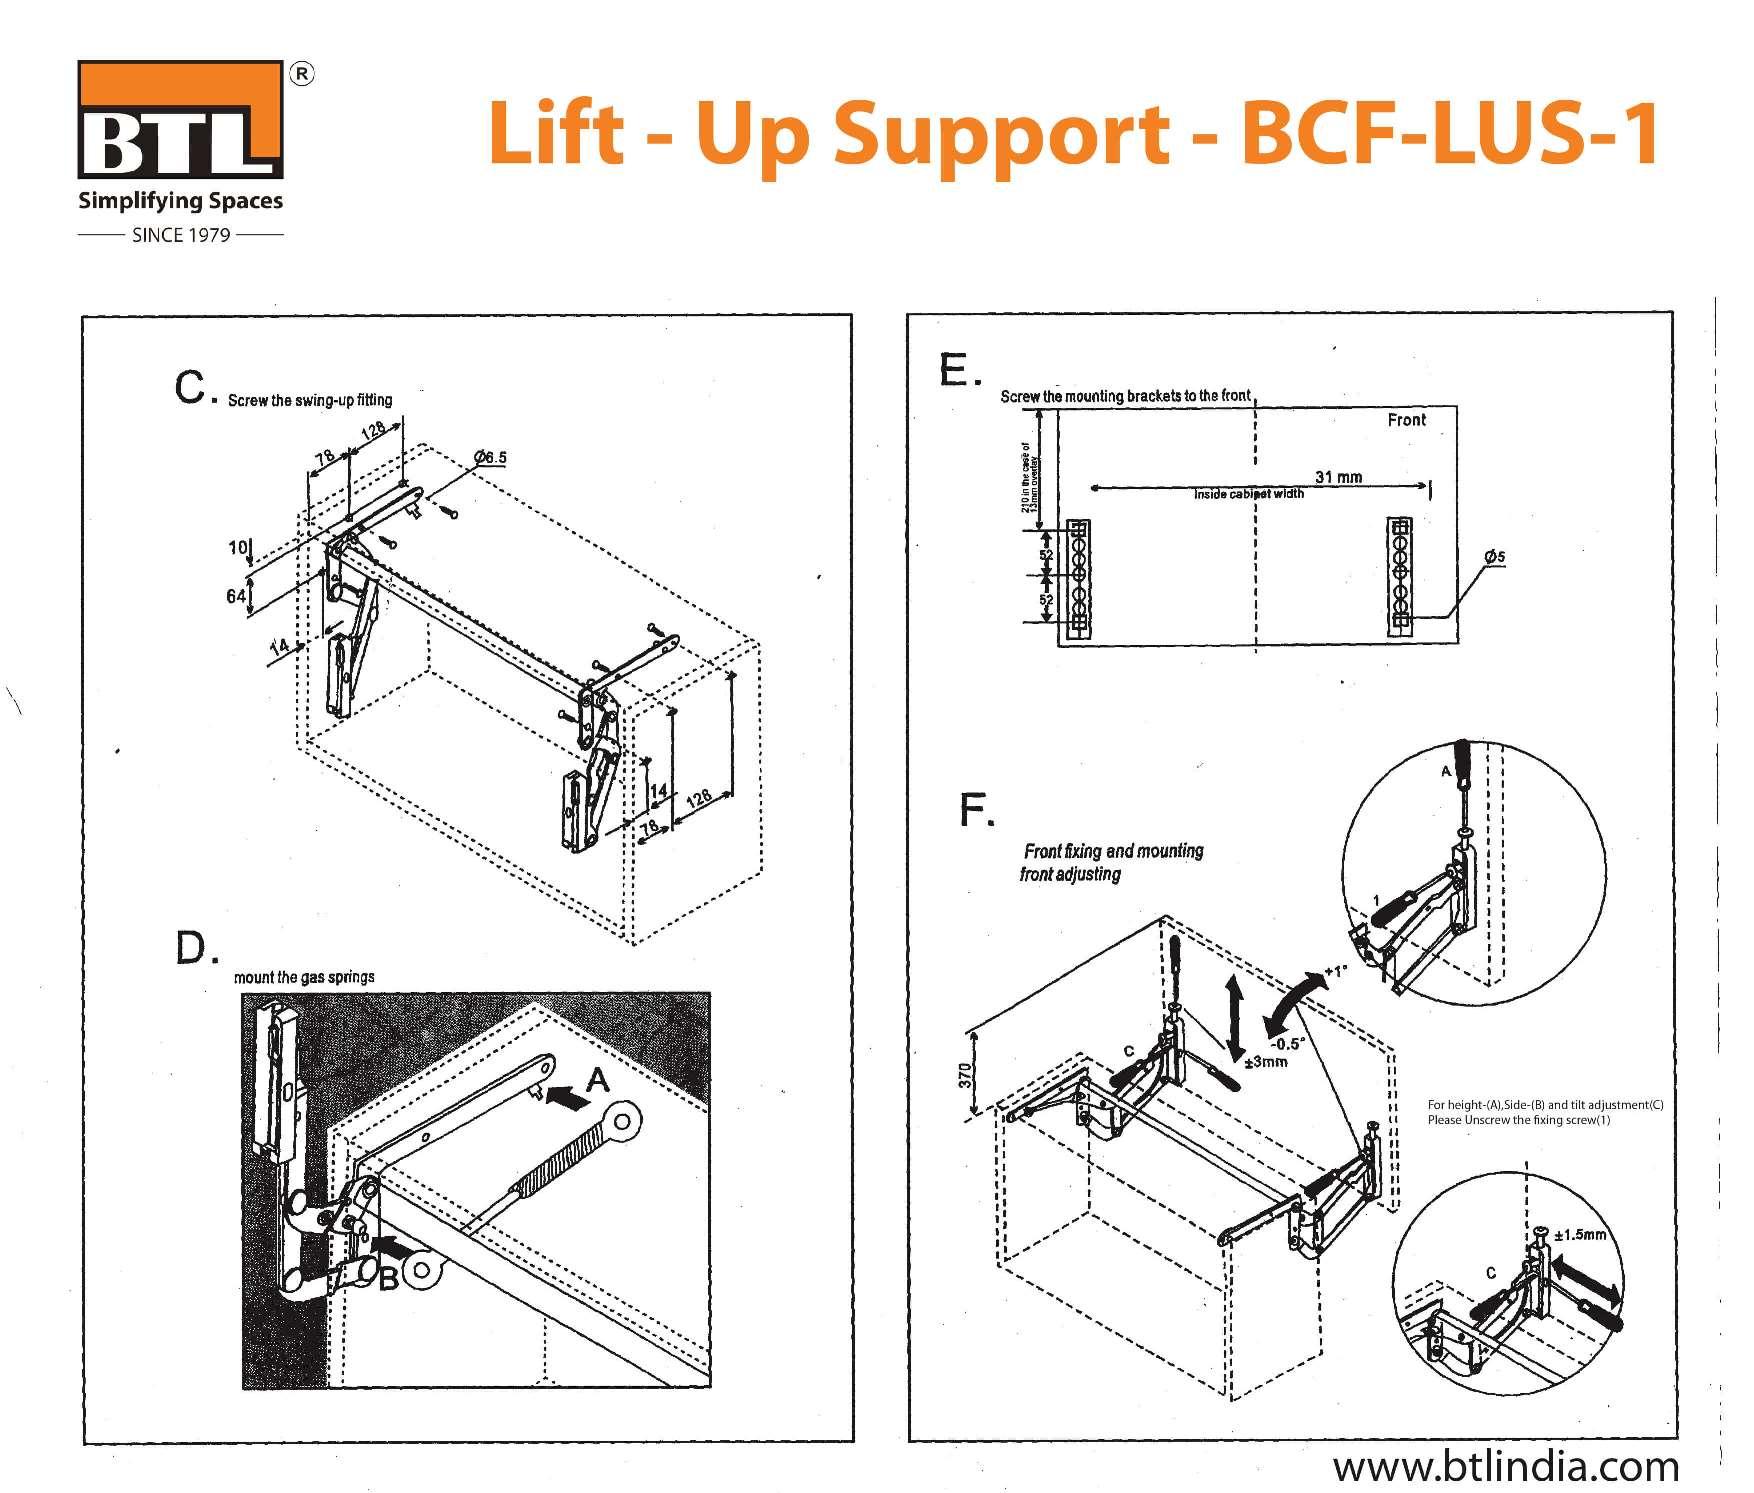 BTL Lift - Up Support - BCF-LUS-1 - Soft Close -Load Weight: 5Kg